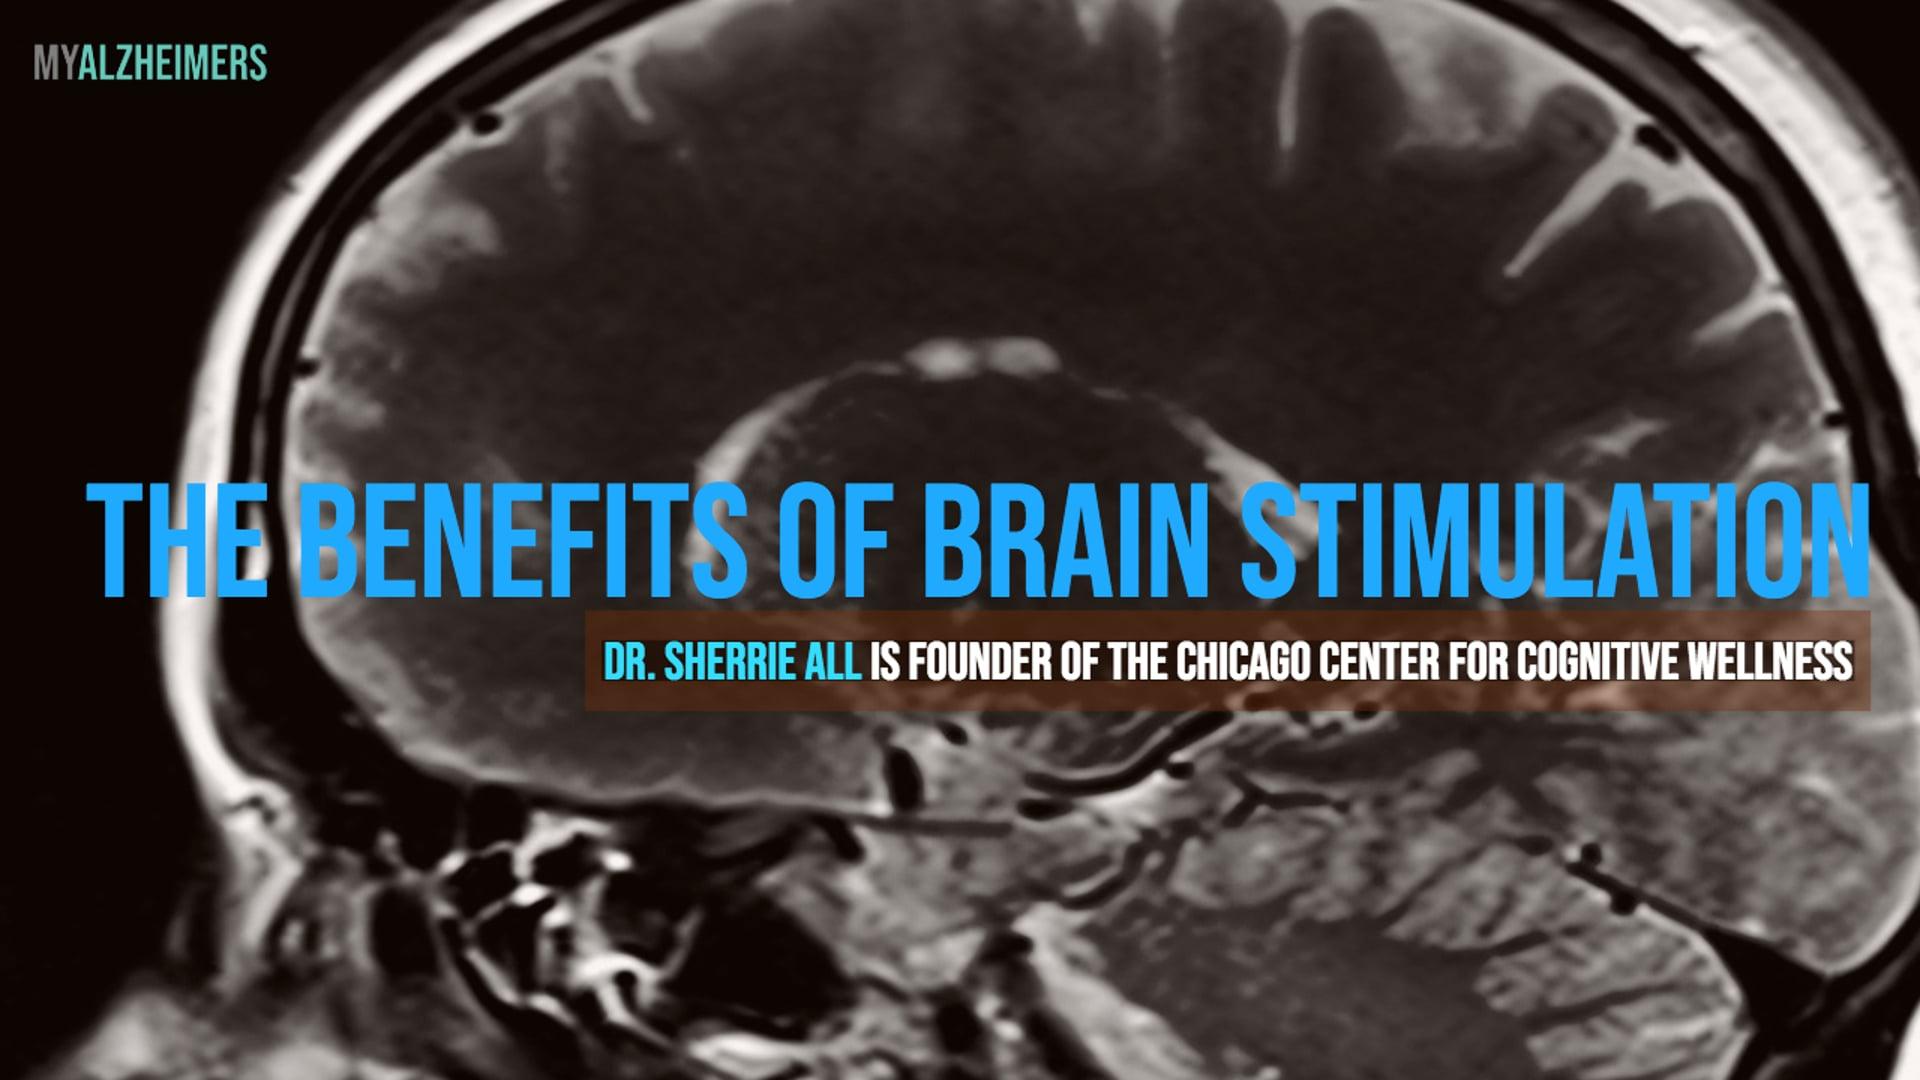 The Benefits of Brain Stimulation